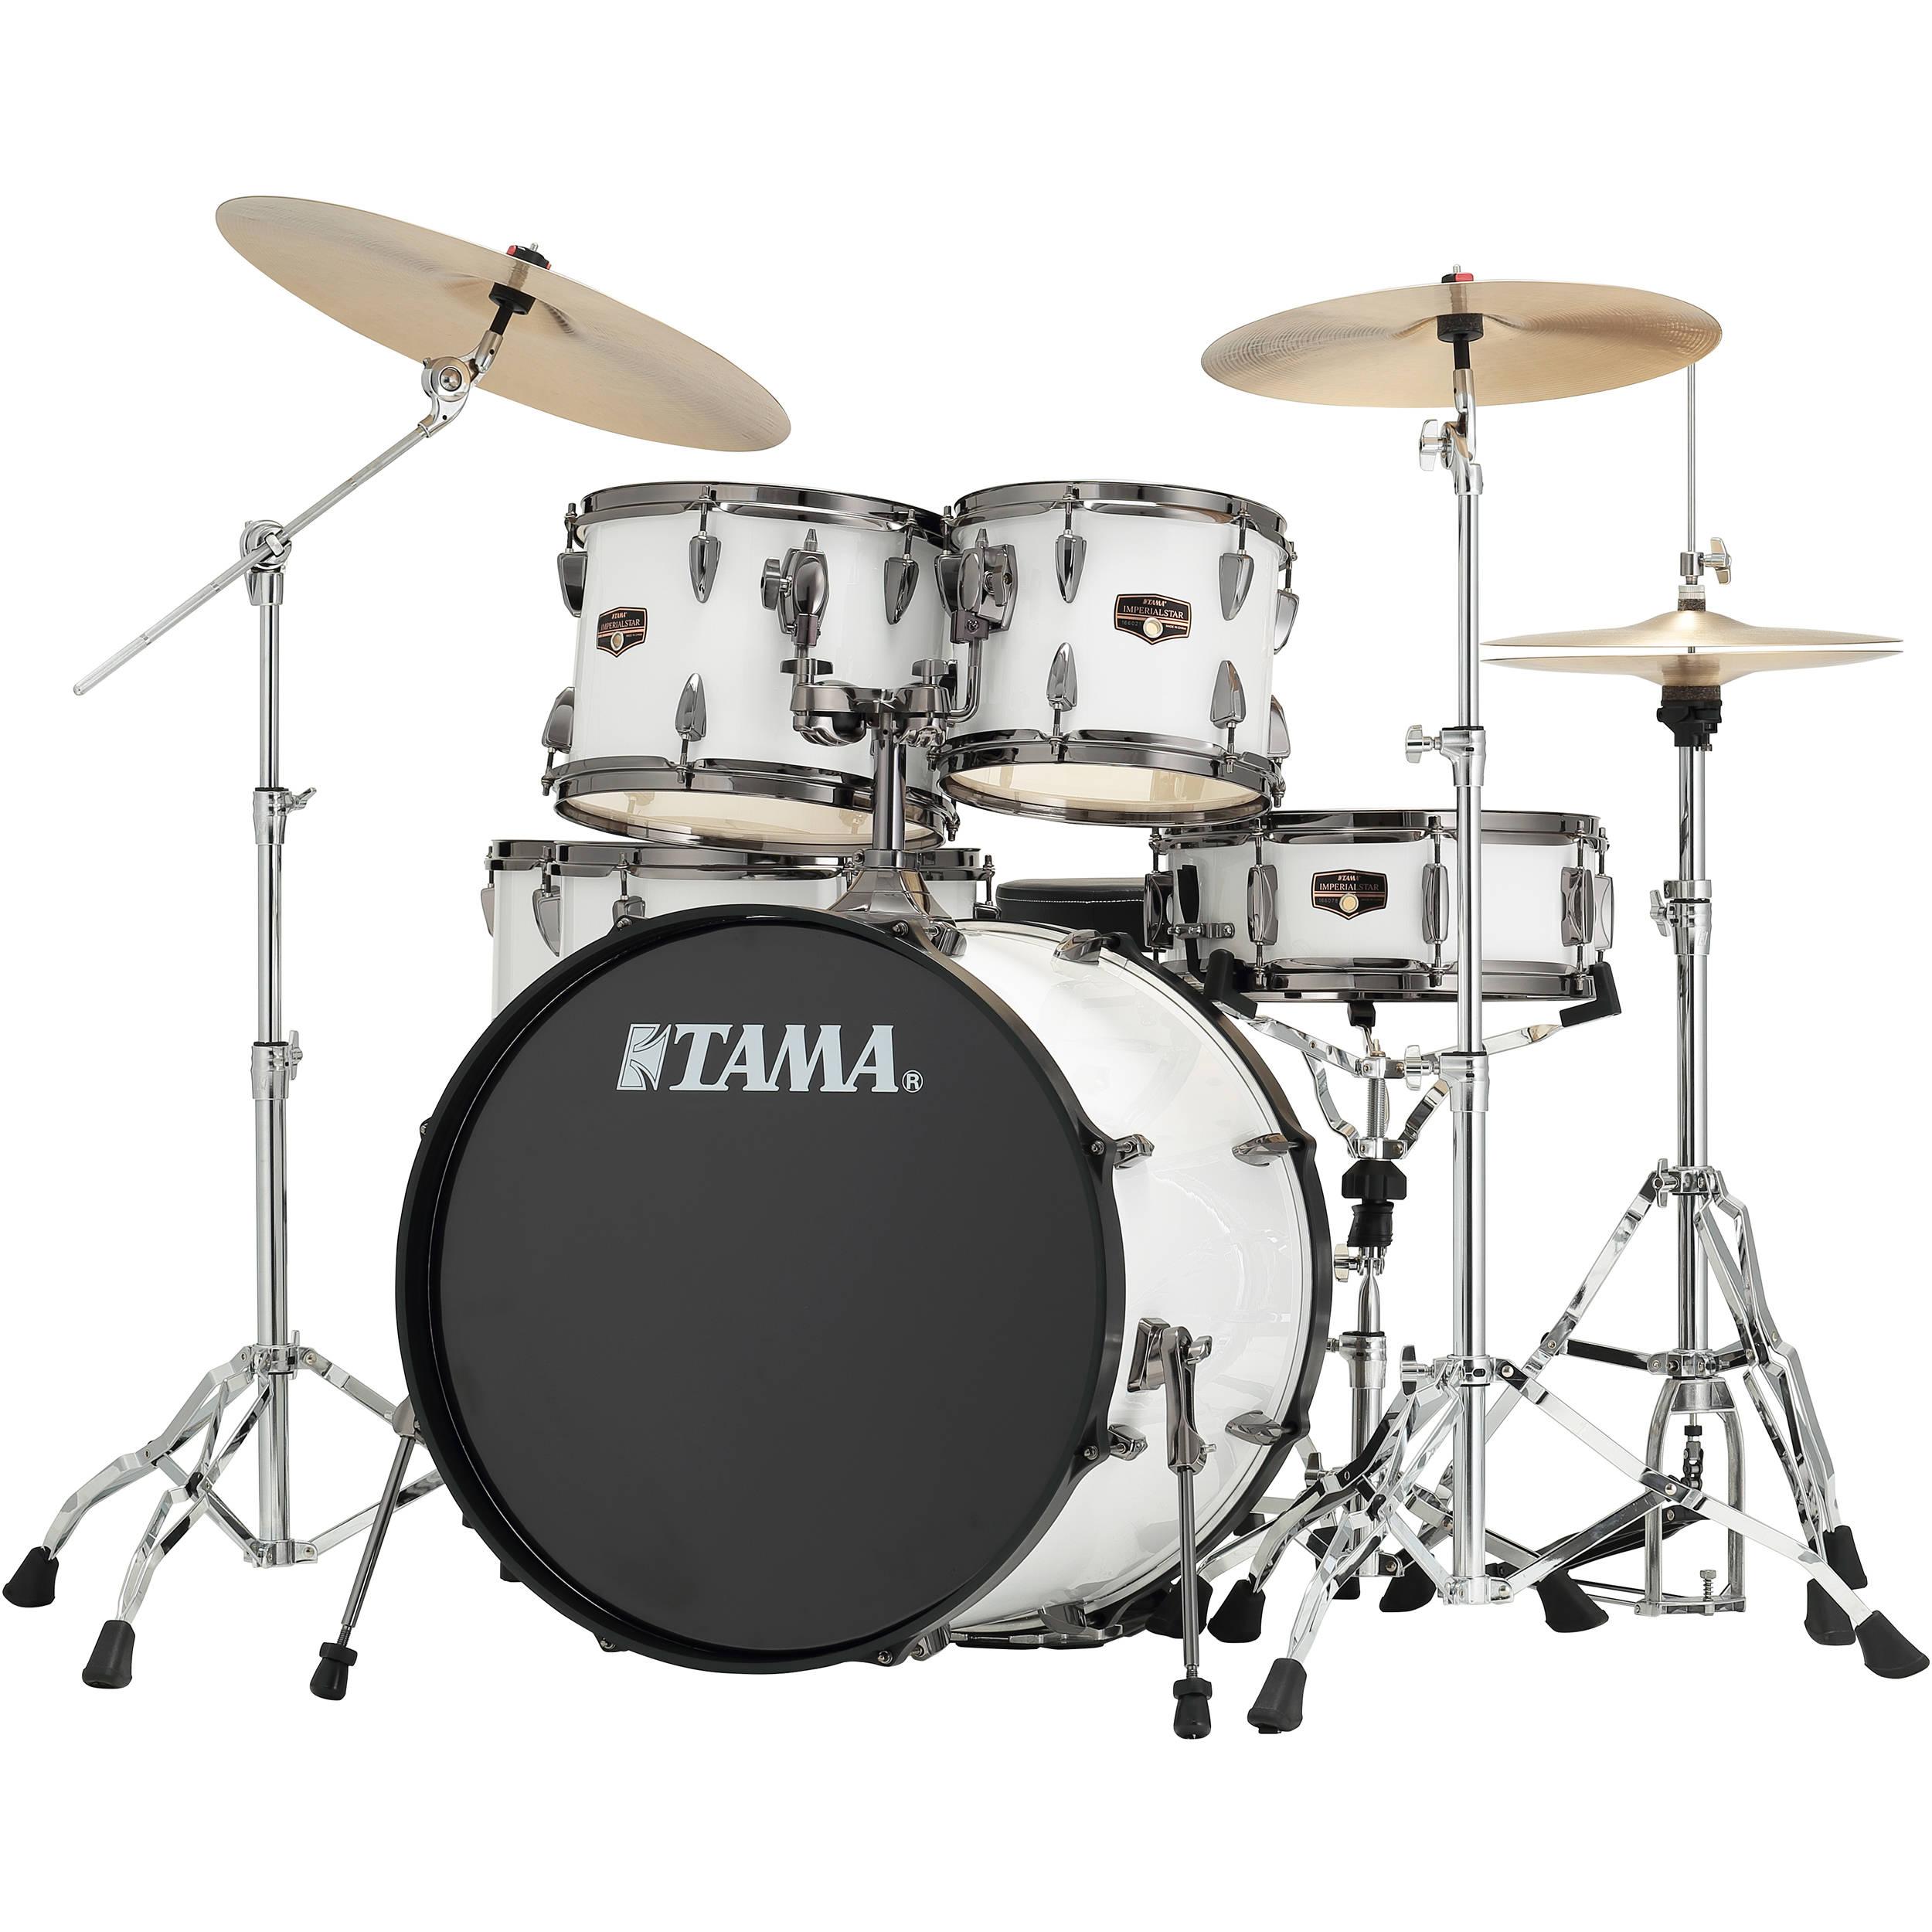 tama ip62nbcsgw imperialstar 6 piece drum set ip62nbcsgw b h. Black Bedroom Furniture Sets. Home Design Ideas